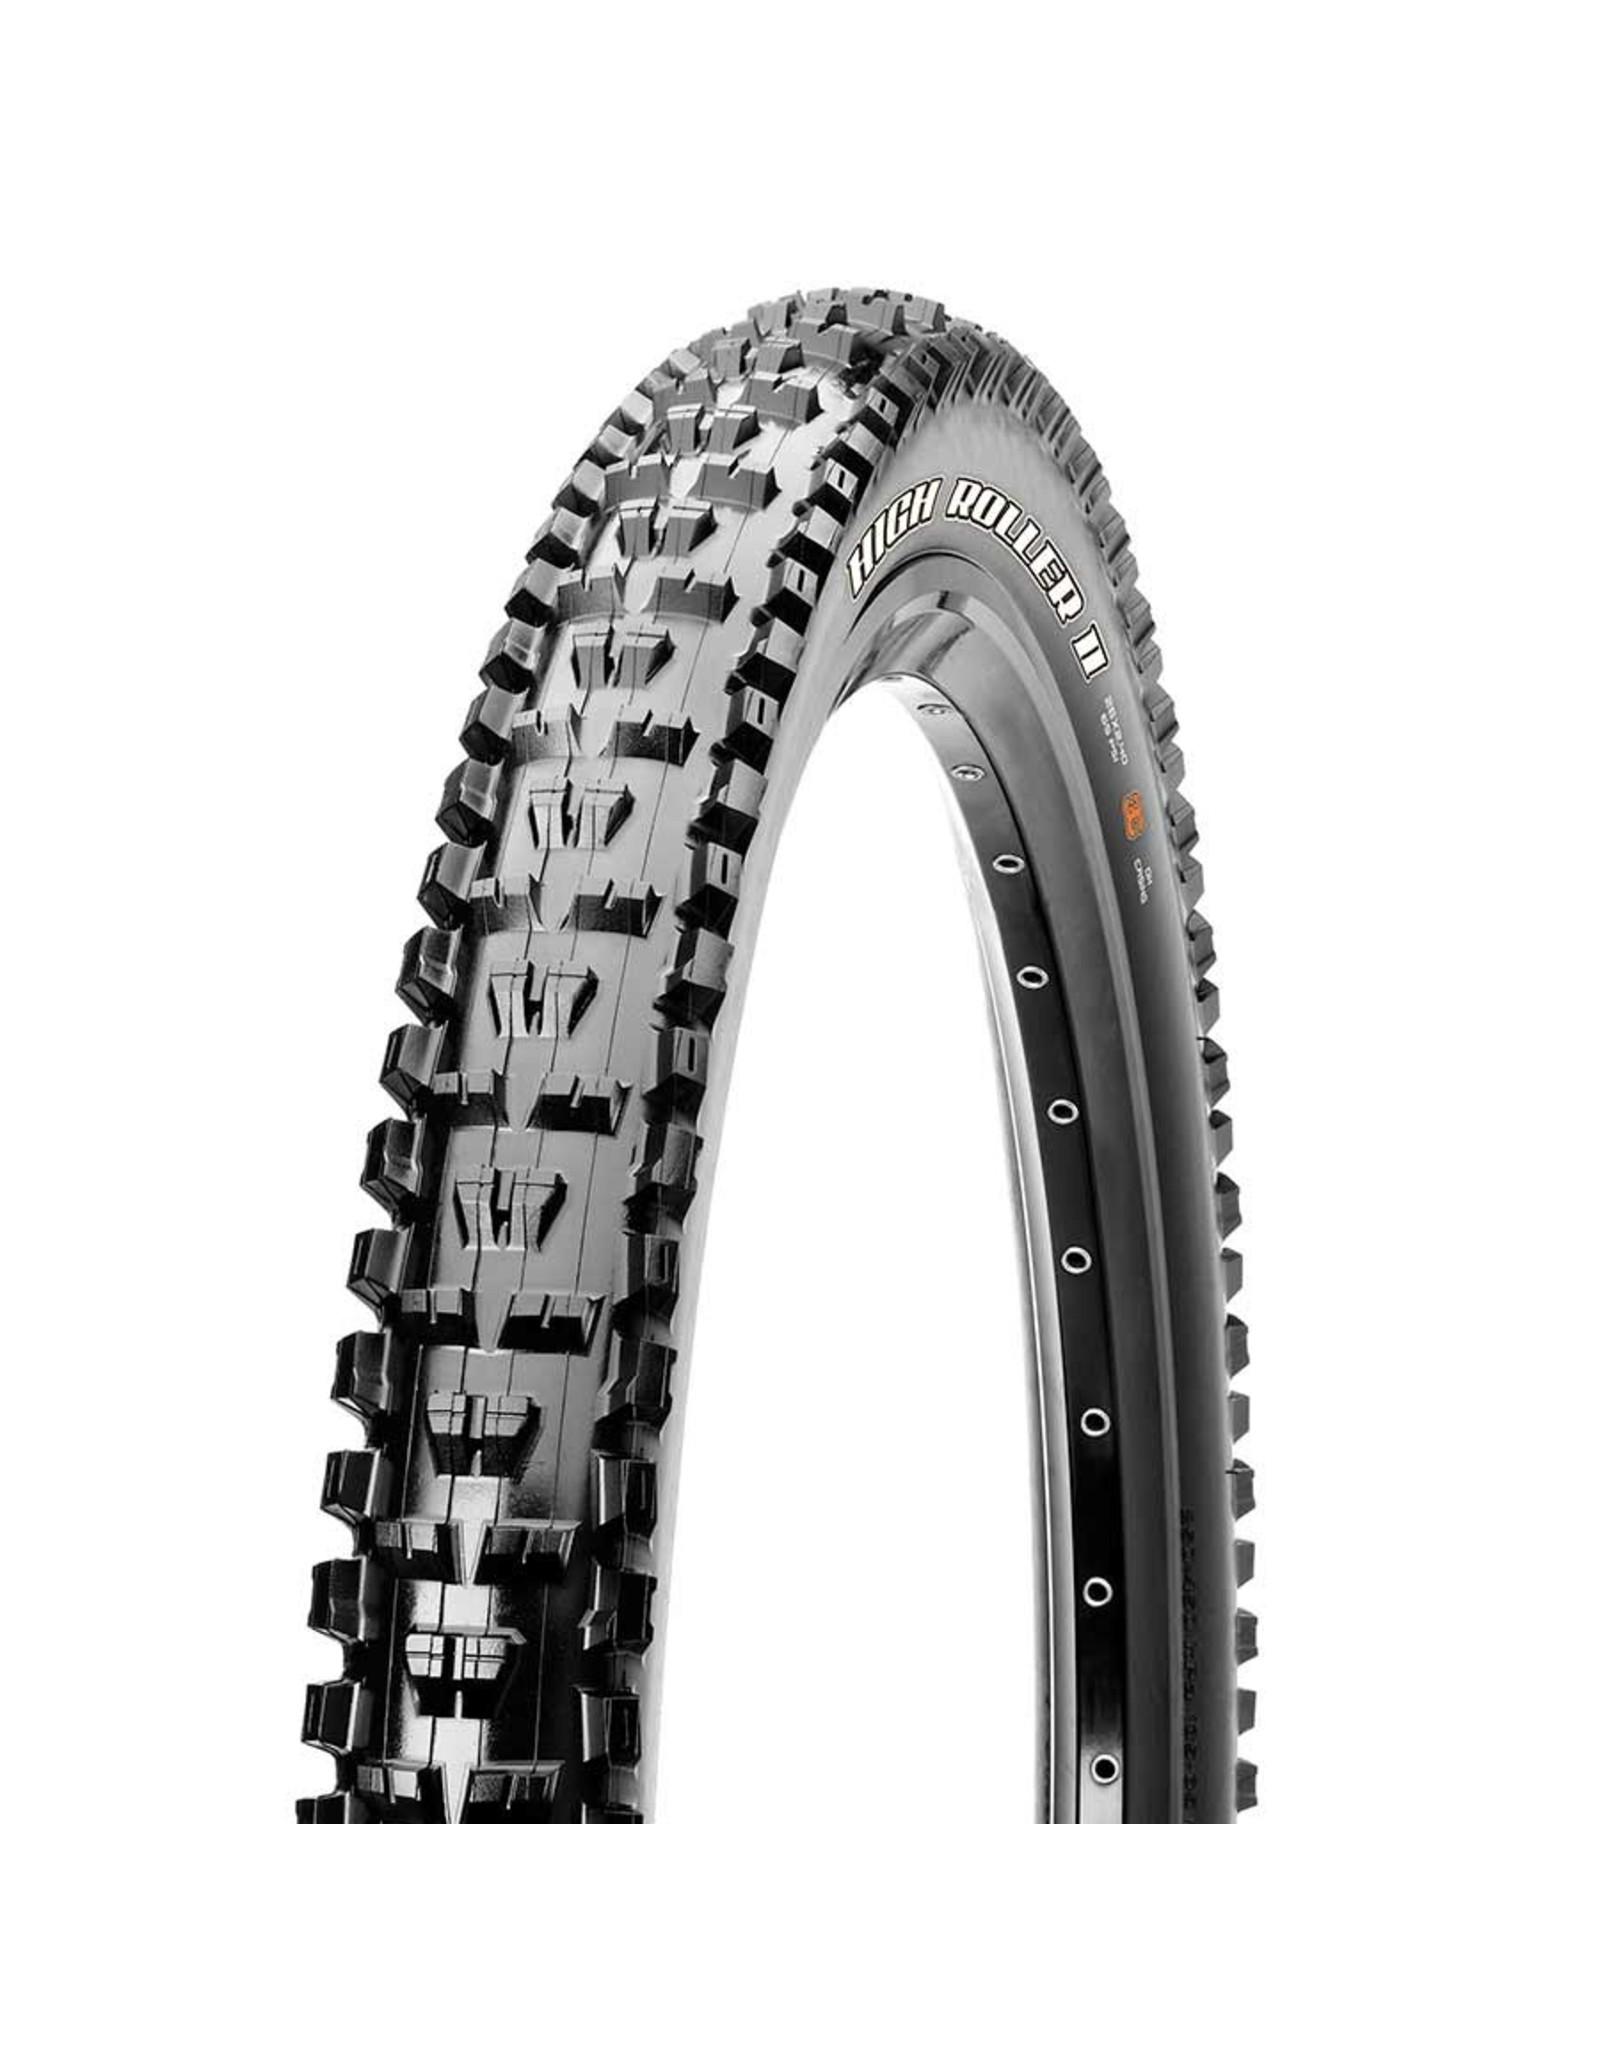 Maxxis, High Roller II, Tire, 27.5''x2.40, Folding, Tubeless Ready, 3C Maxx Grip, 2-ply, 60TPI, Black